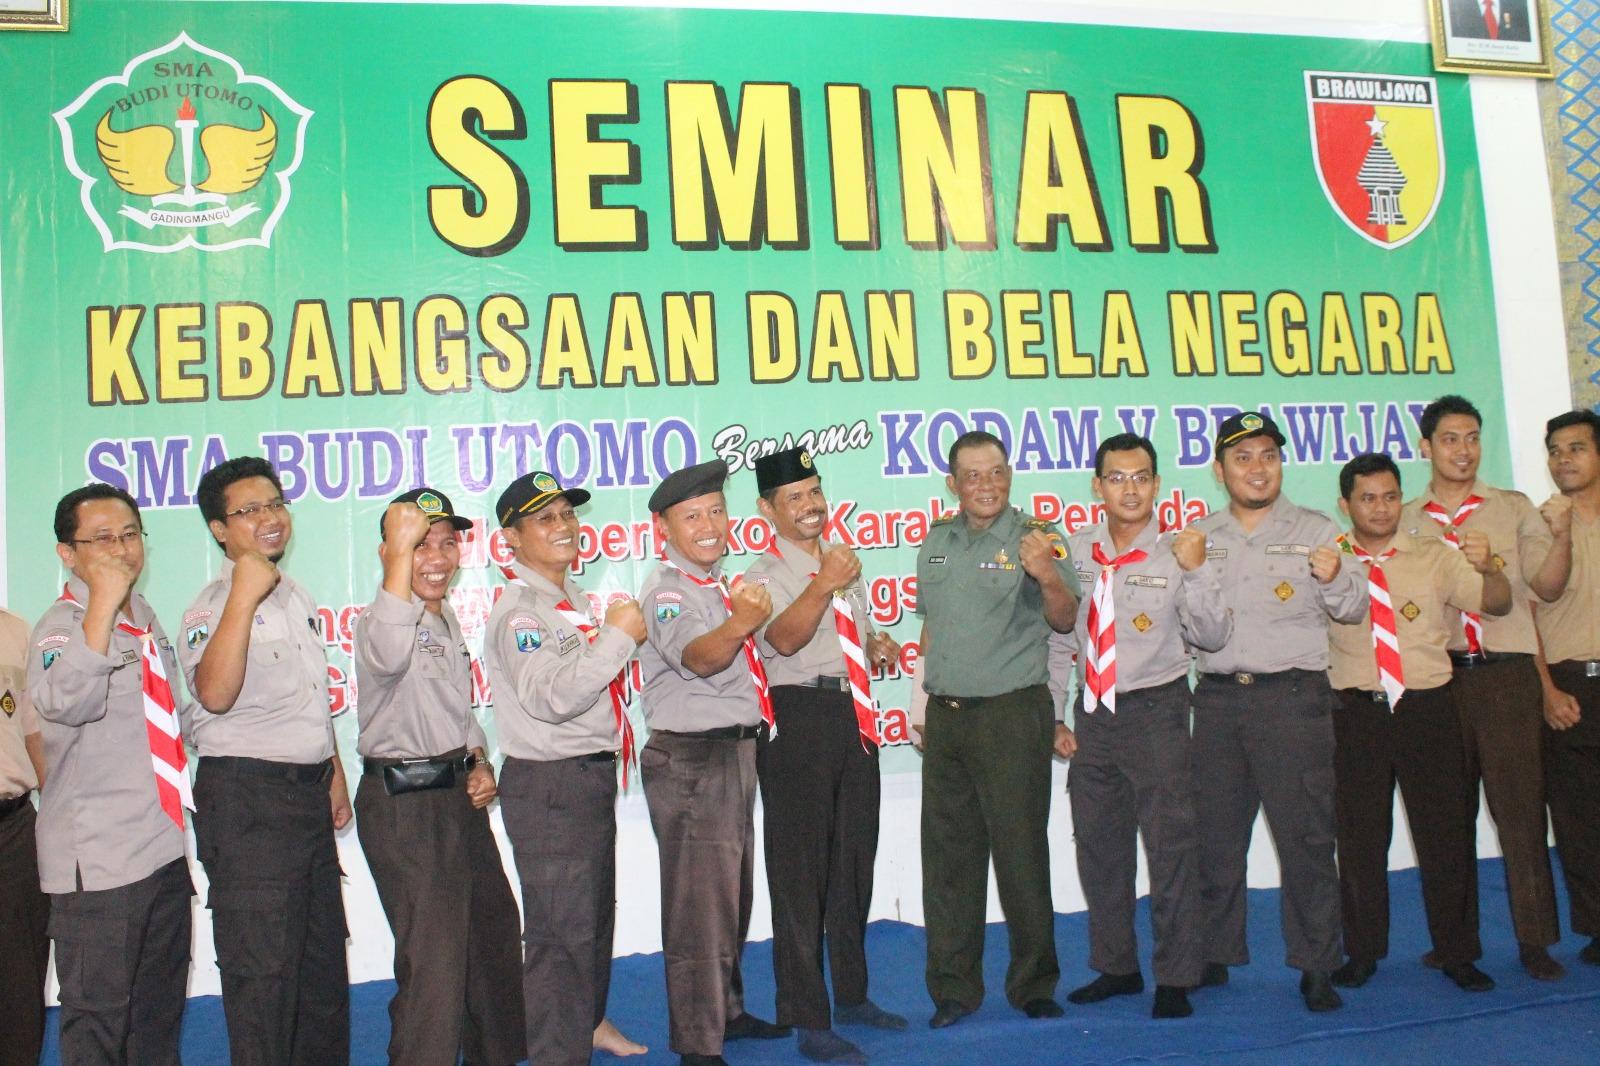 abandya Bakti TNI Staf Teritorial Daerah Militer (Sterdam) V/Brawijaya, Letkol Inf Drs. Didi Suryadi, MAP dan guru SMA Budi Utomo.